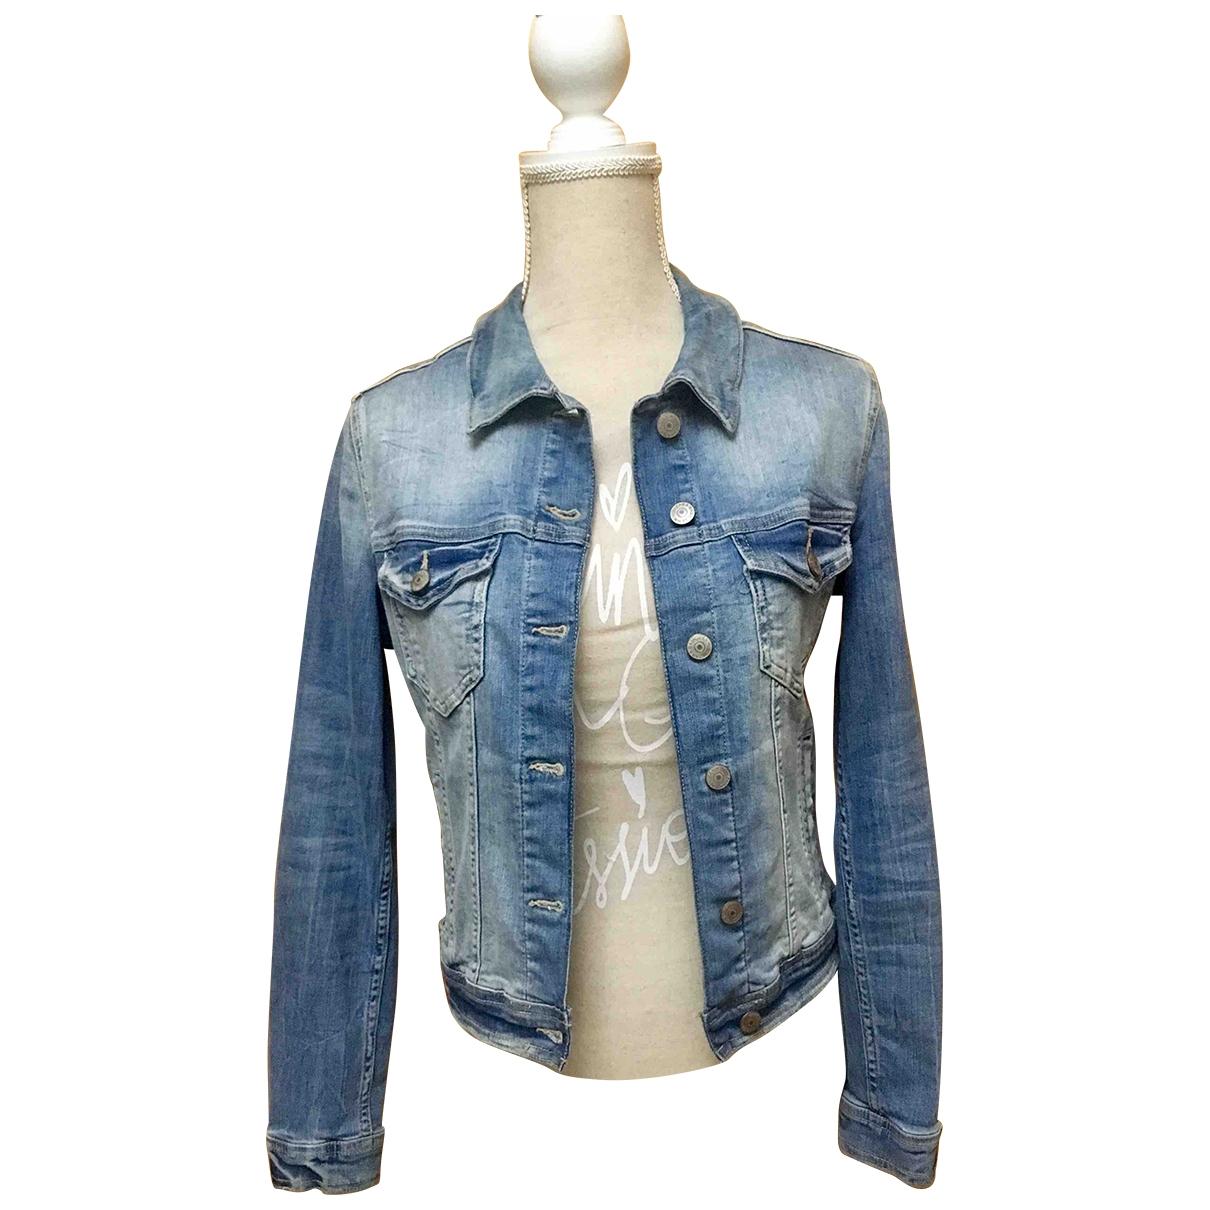 Zara \N Lederjacke in  Blau Denim - Jeans